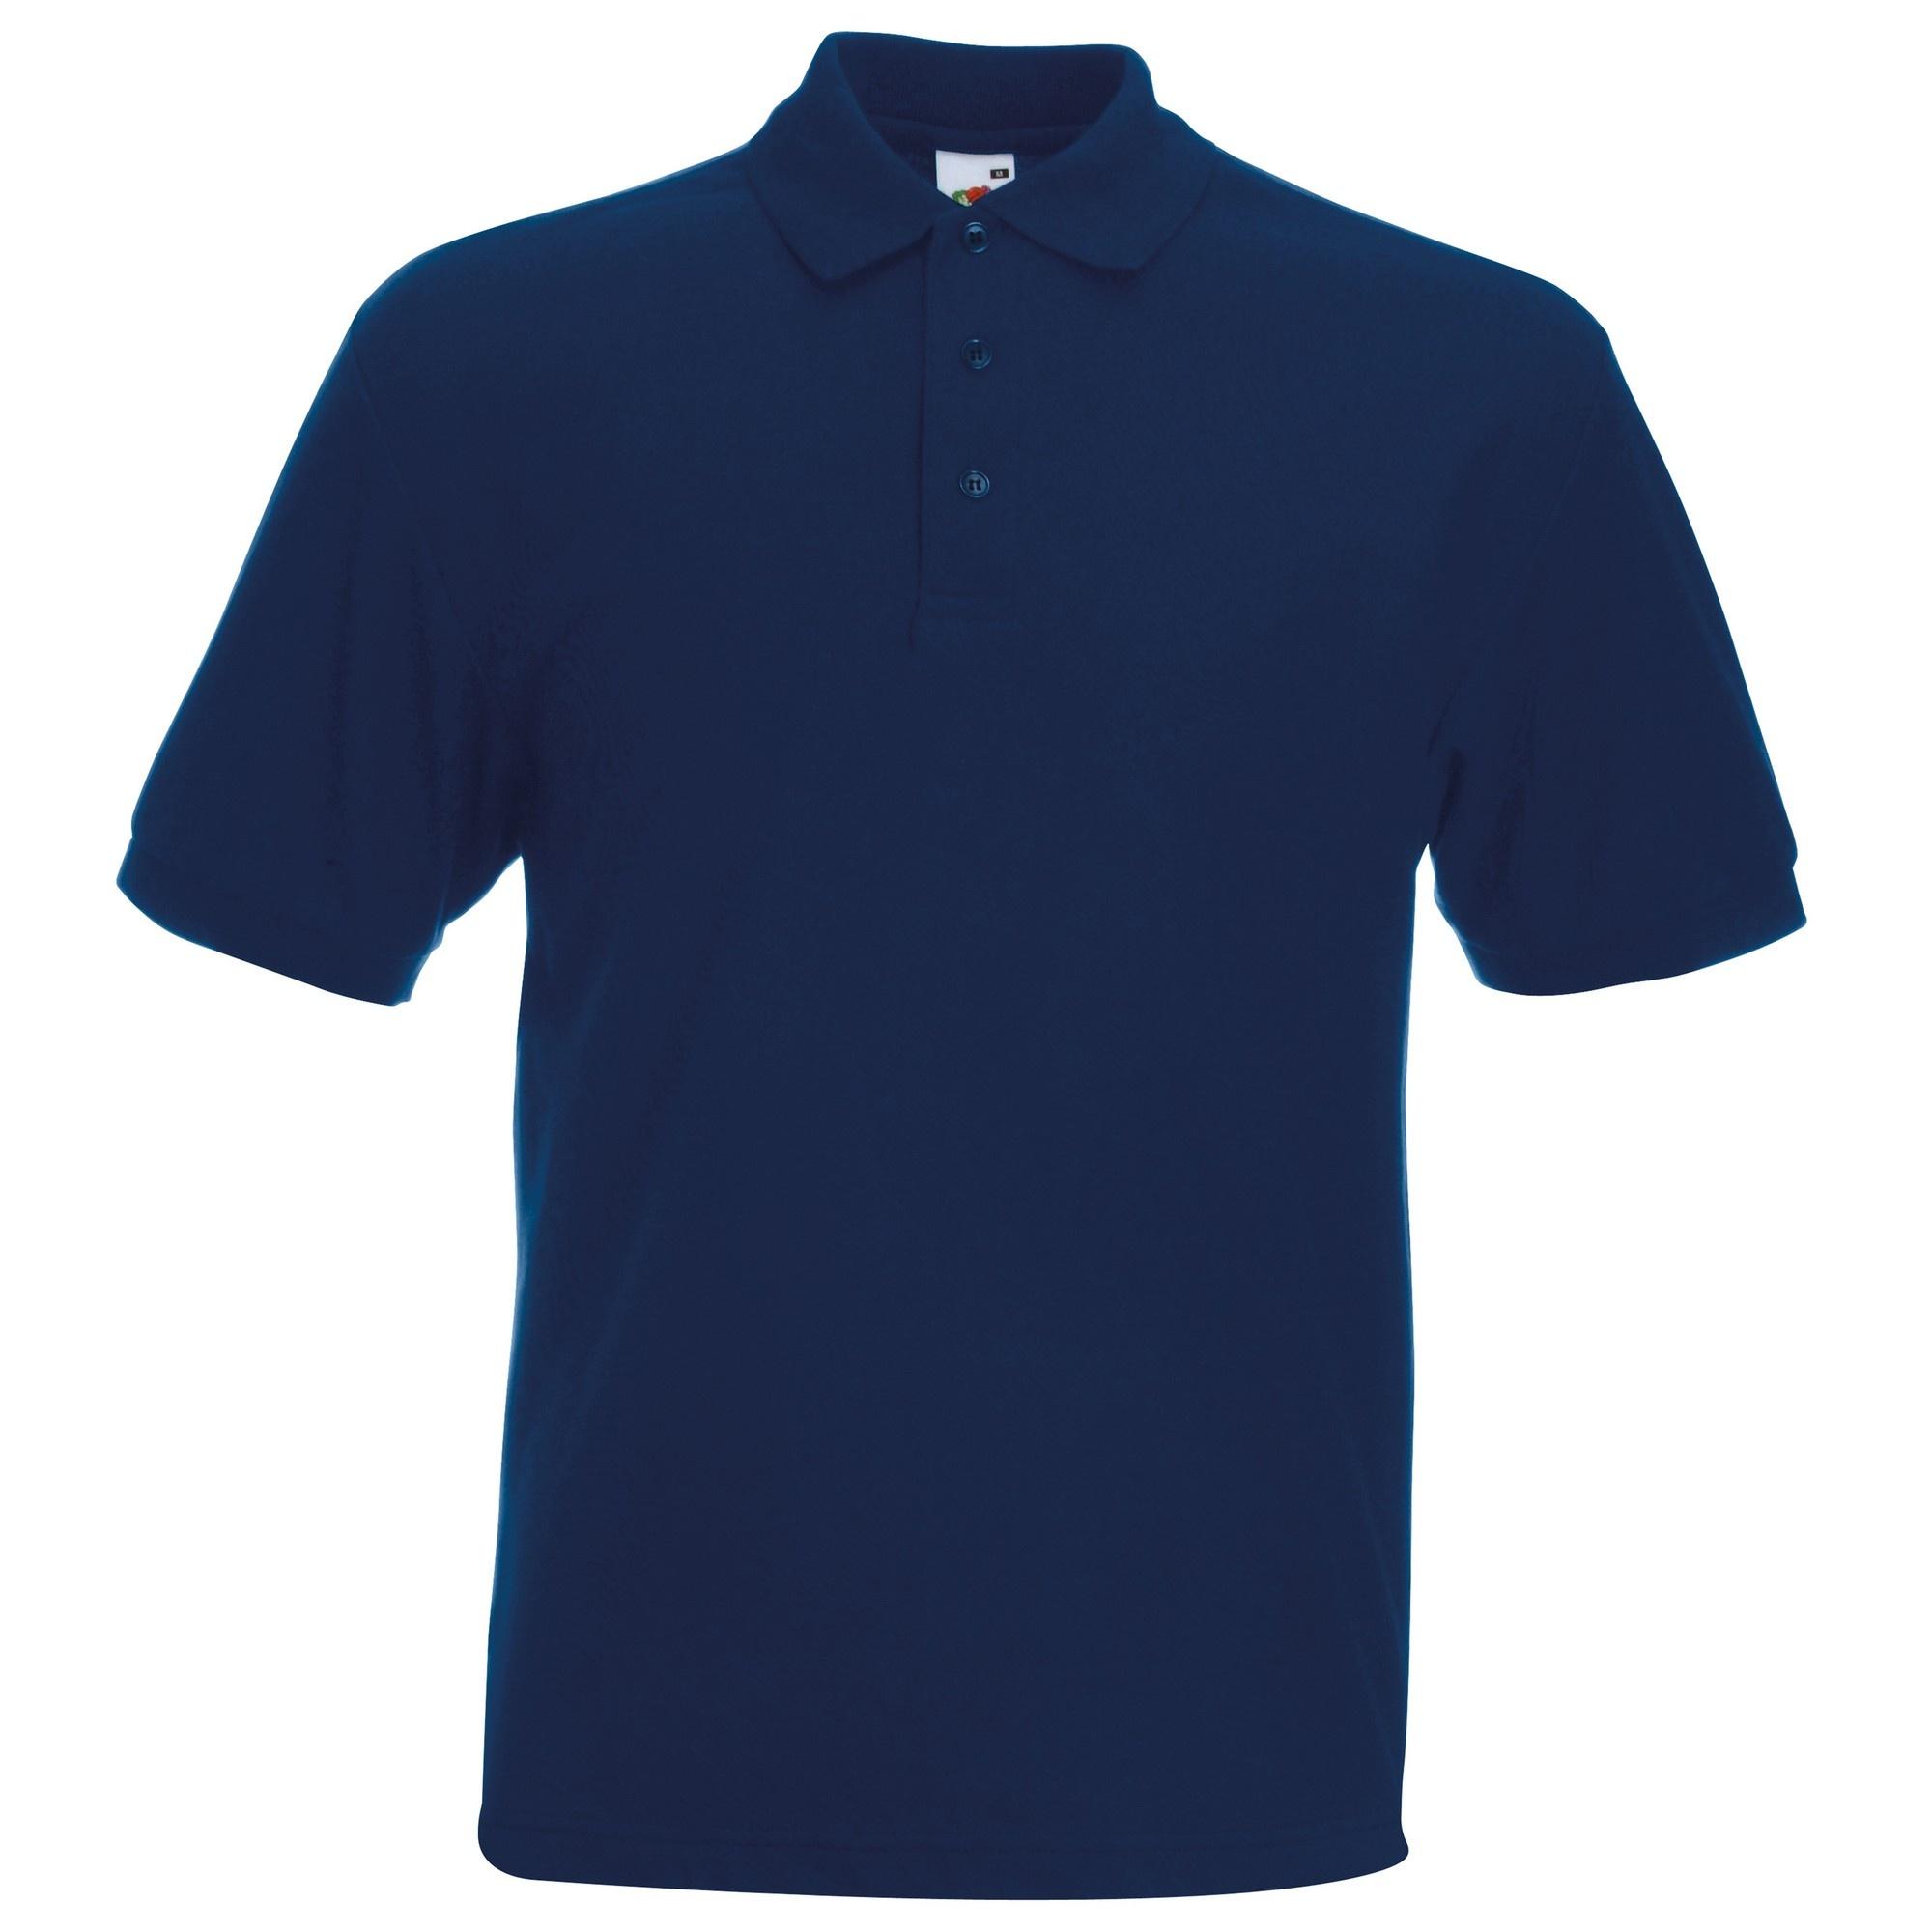 Fruit-Of-The-Loom-Mens-65-35-Heavyweight-Pique-Short-Sleeve-Polo-Shirt-BC382